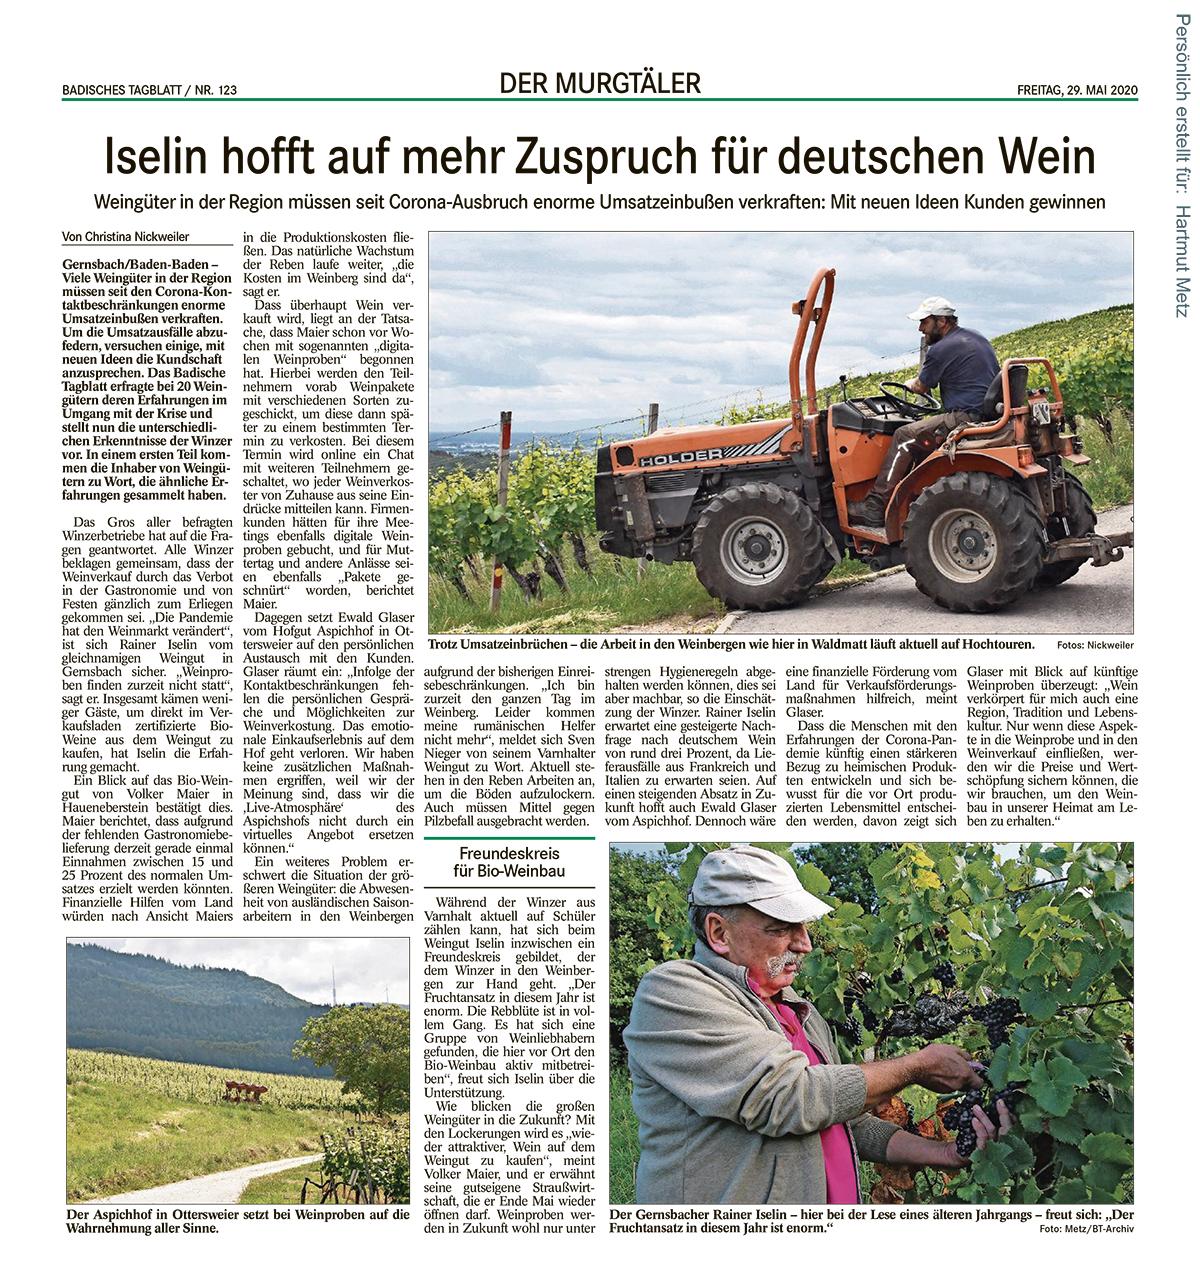 Badisches Tagblatt, Ausgabe: Murgtal, vom: Freitag, 29. Mai 2020